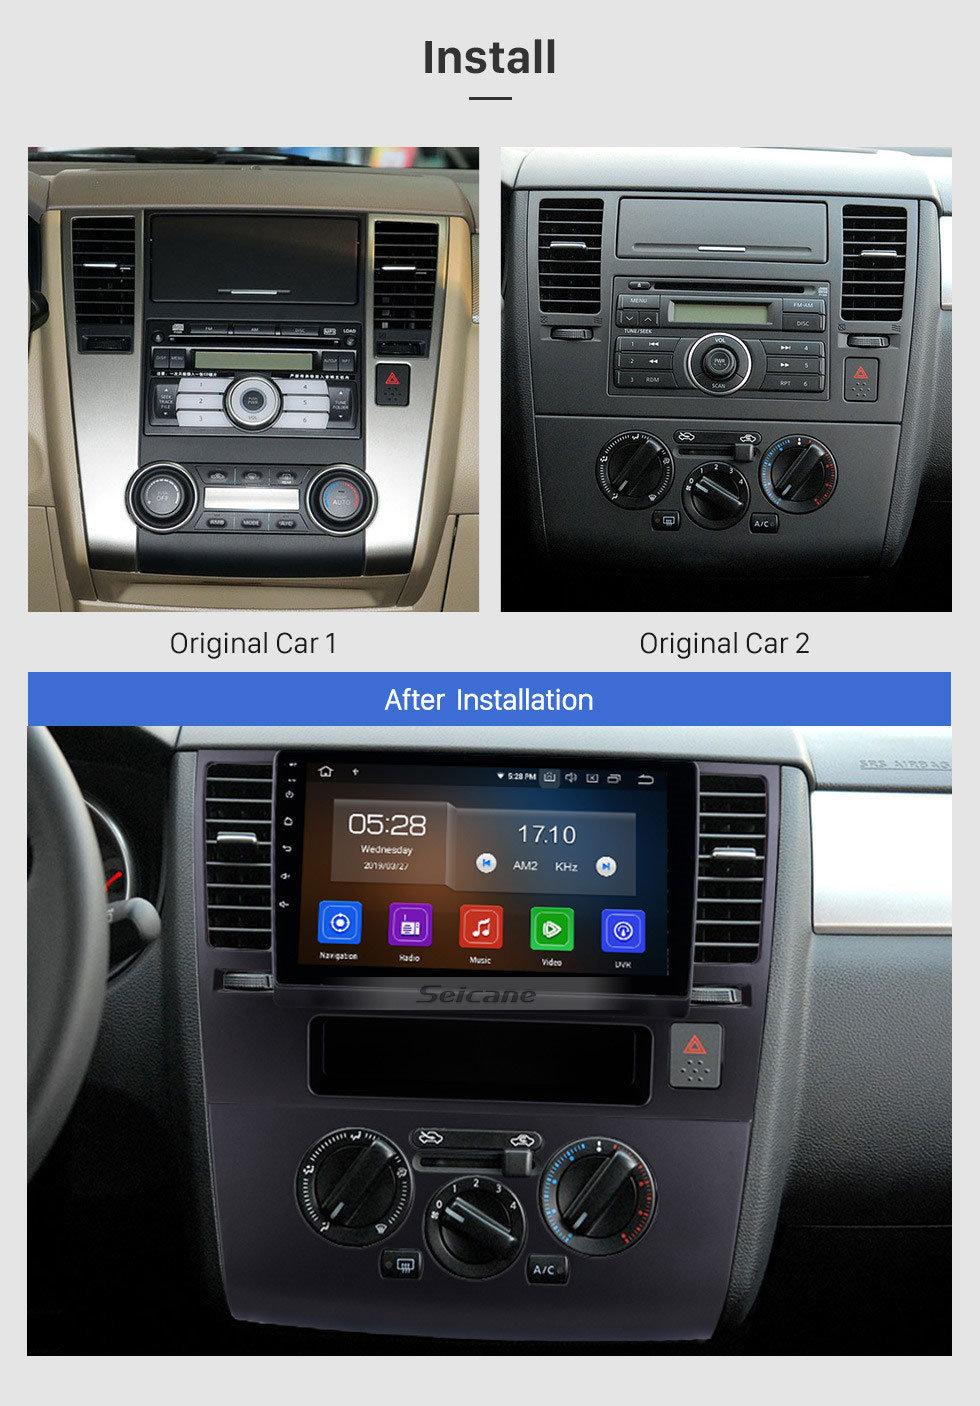 Seicane 9 Inch HD Touchscreen Radio GPS Navigation Android 9.0 2005-2010 Nissan TIIDA Blueooth Music Car Stereo Aux USB DAB+ Steering Wheel Control 4G/3G WiFi